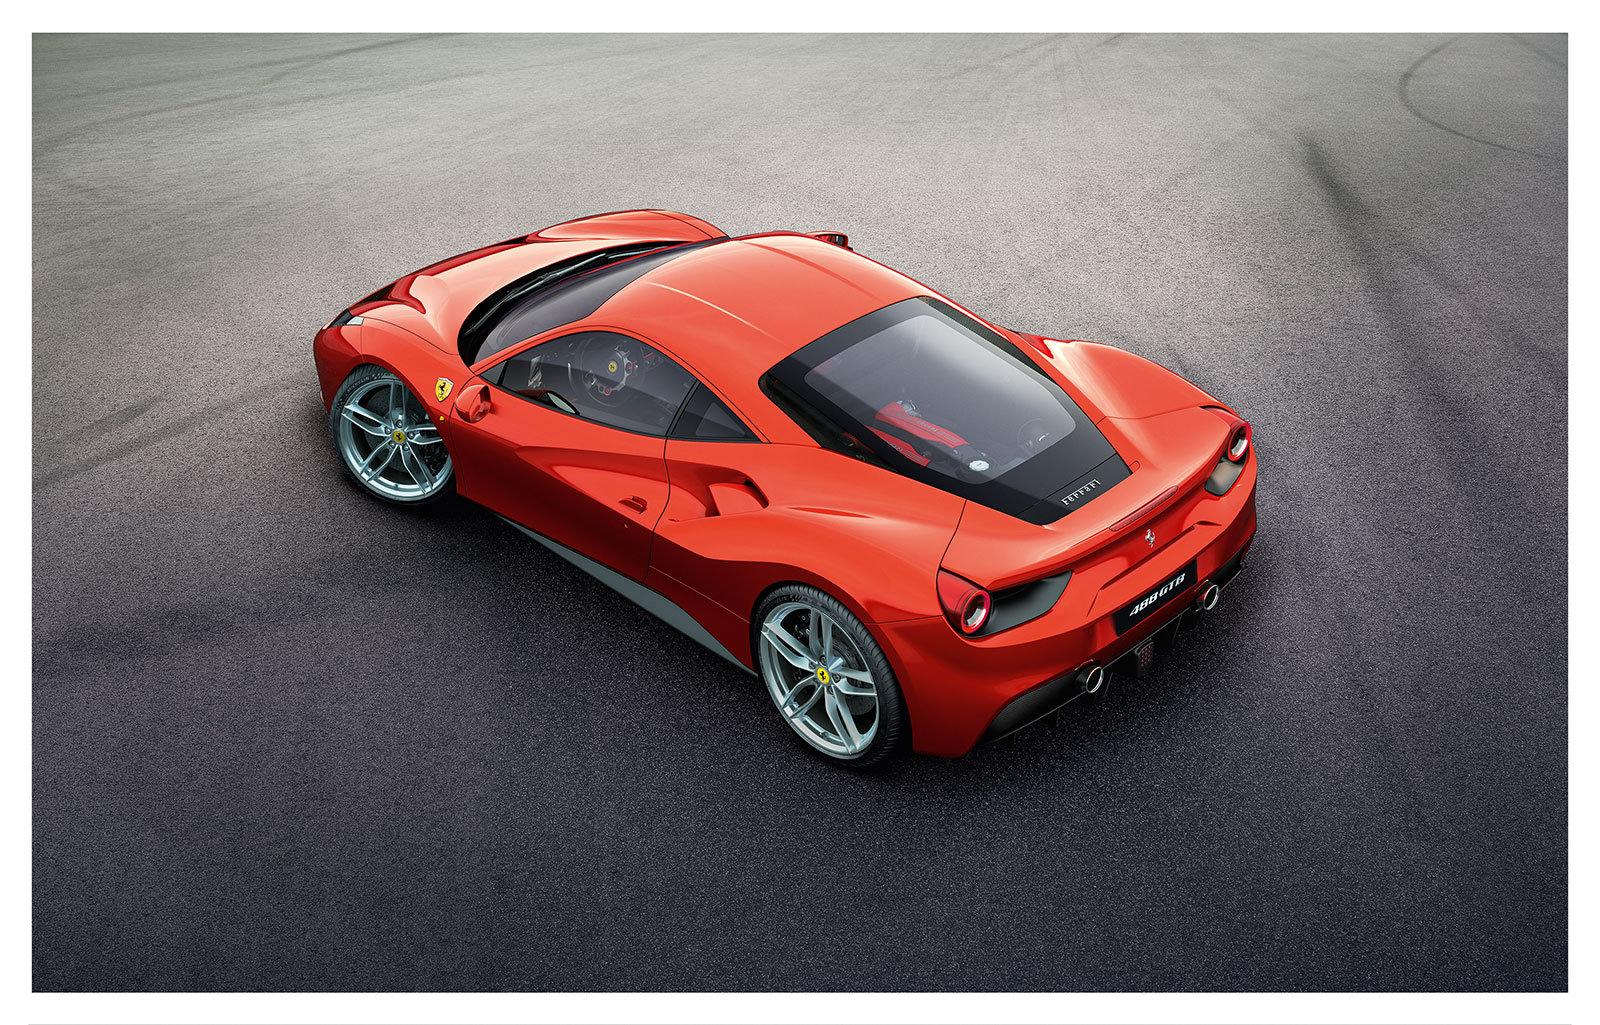 The Ferrari 488